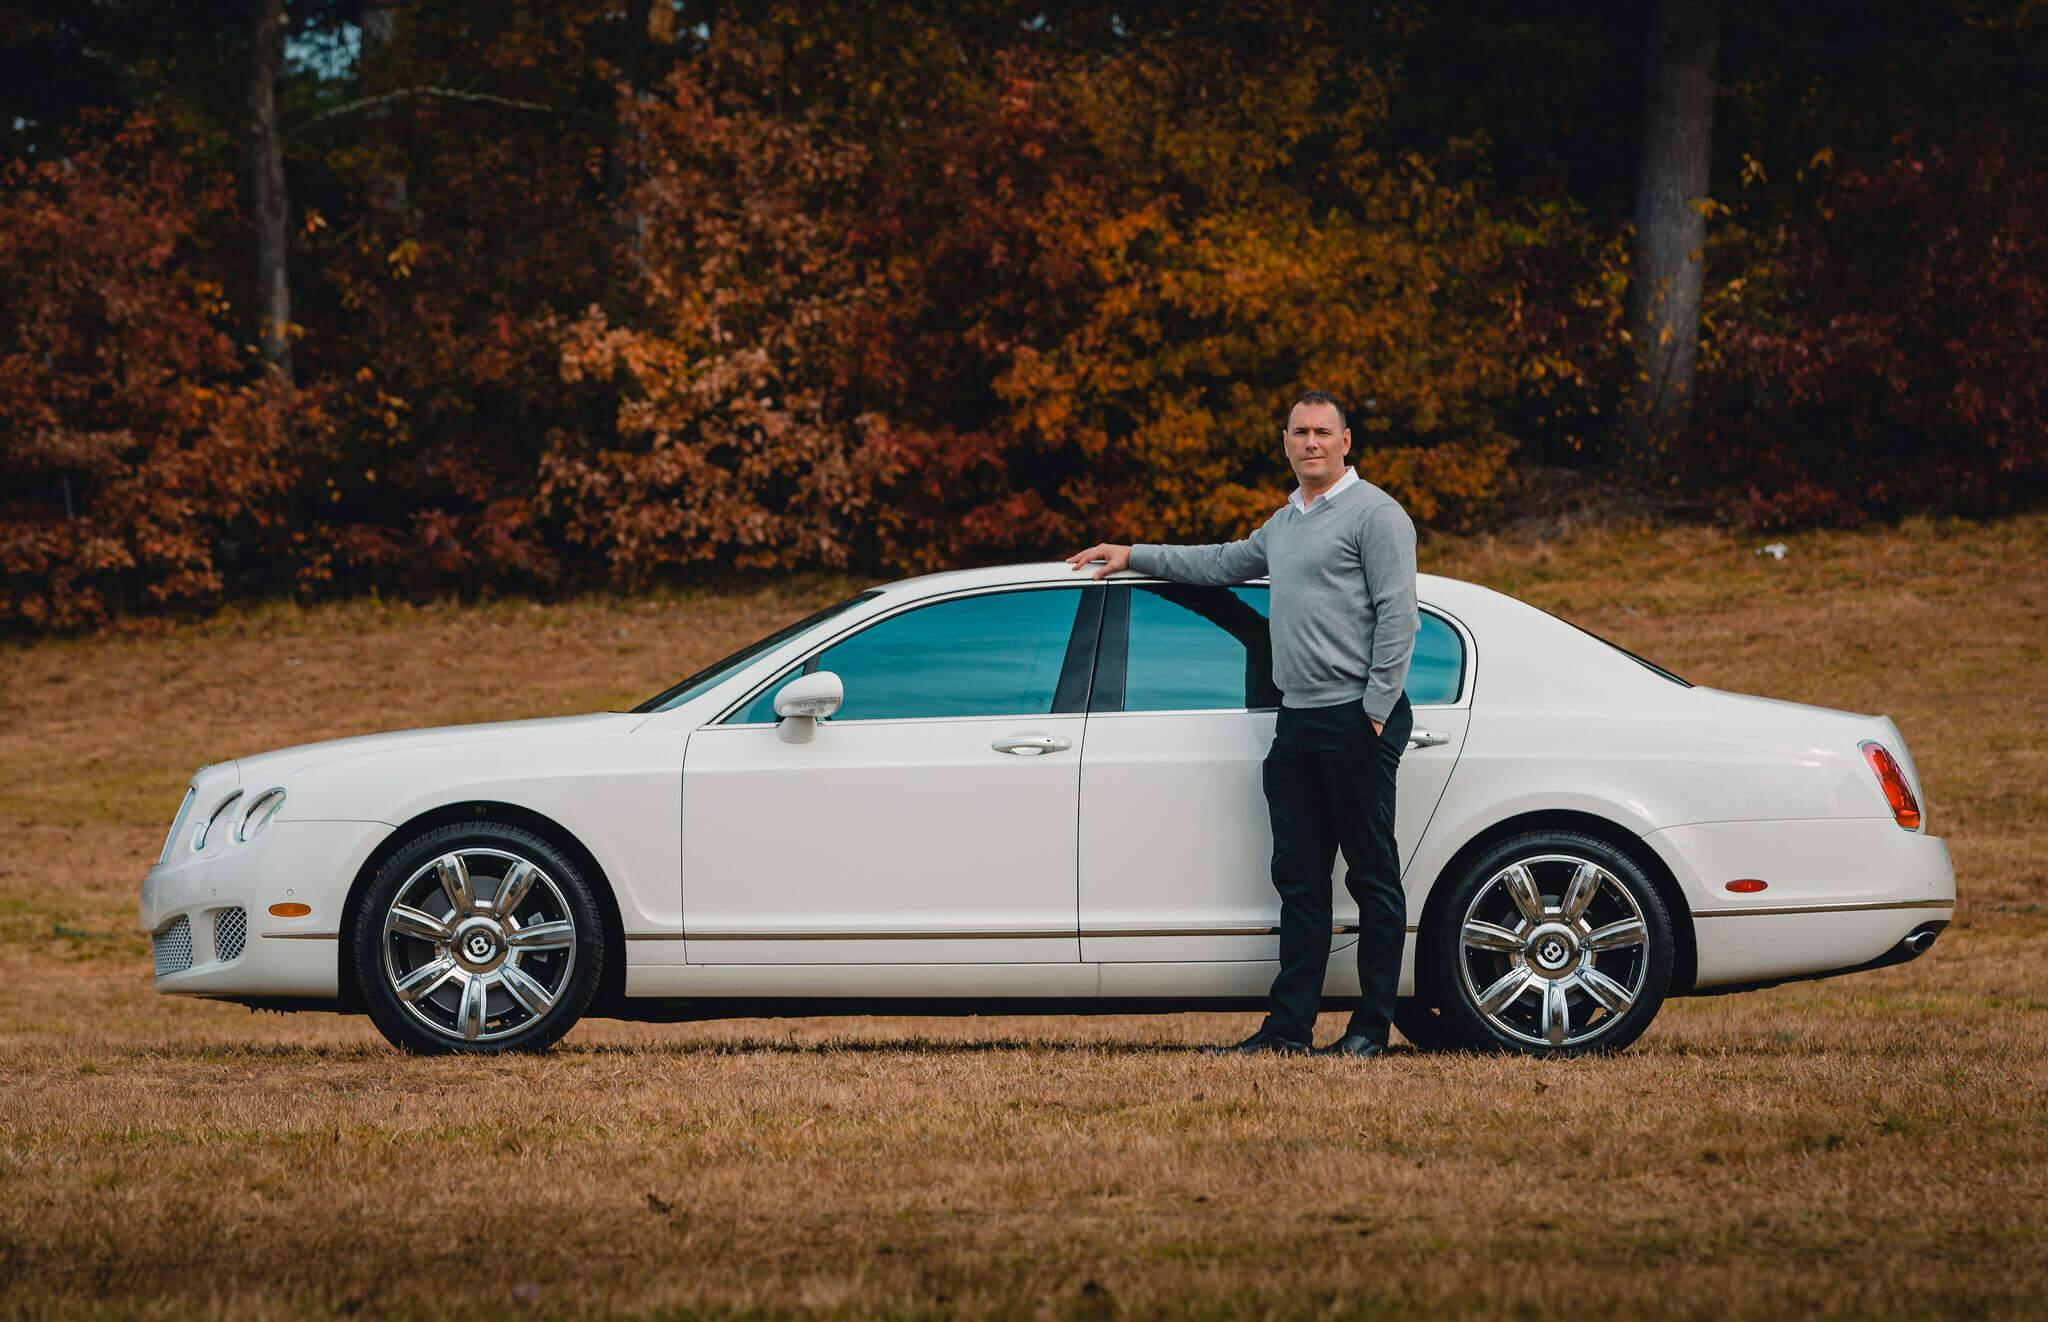 Classic Bentley Wedding Car Rental - Roman Limousine